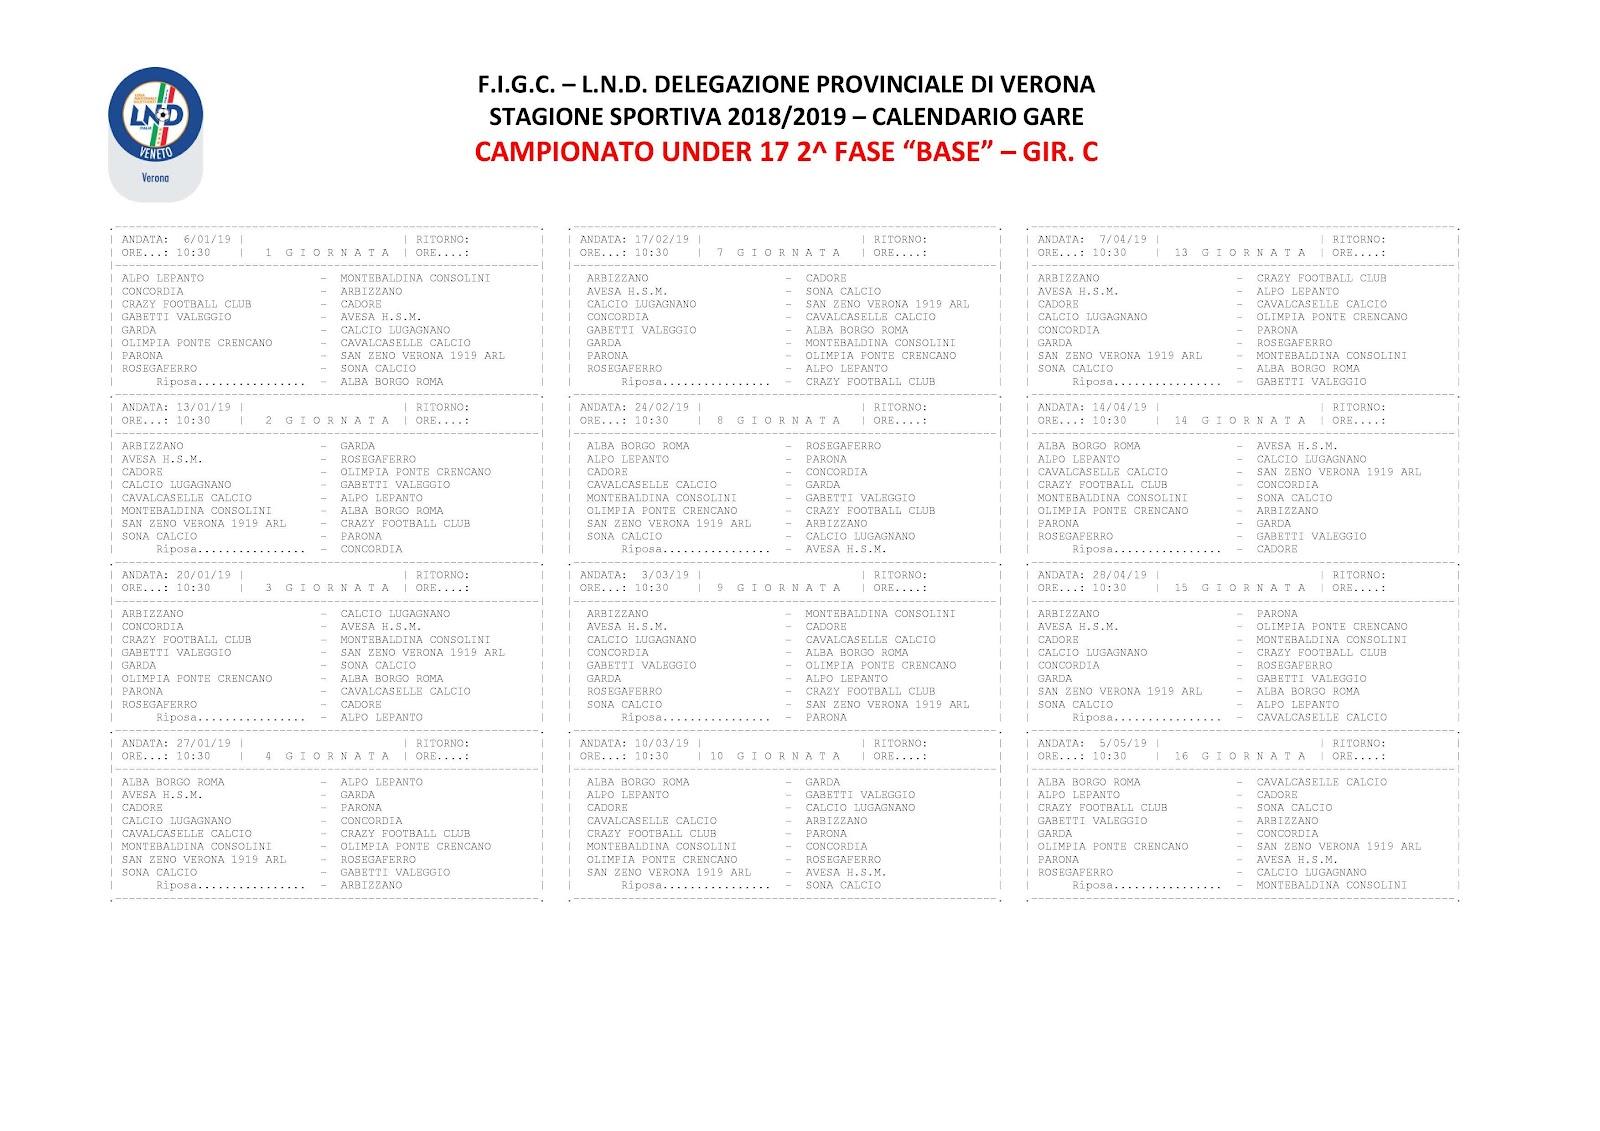 Calendario Under 17.Calendario Under 17 Seconda Fase Girone C Ahsm 1911